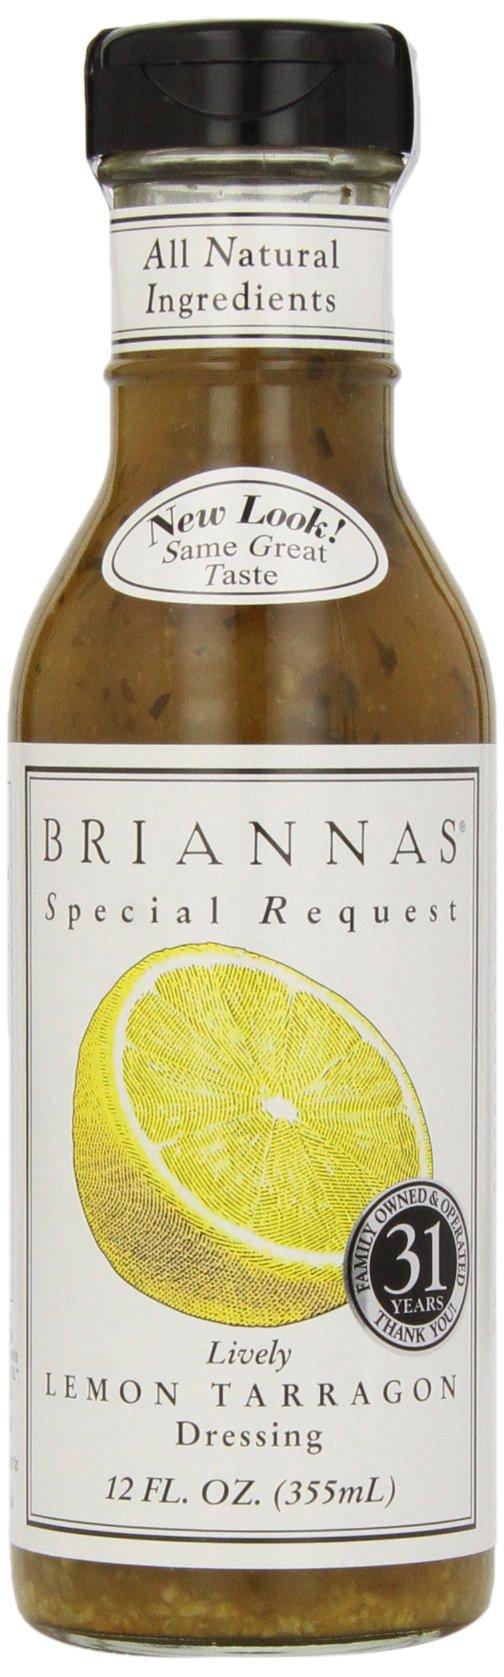 Briannas Lively Lemon Tarragon Dressing, 12 oz